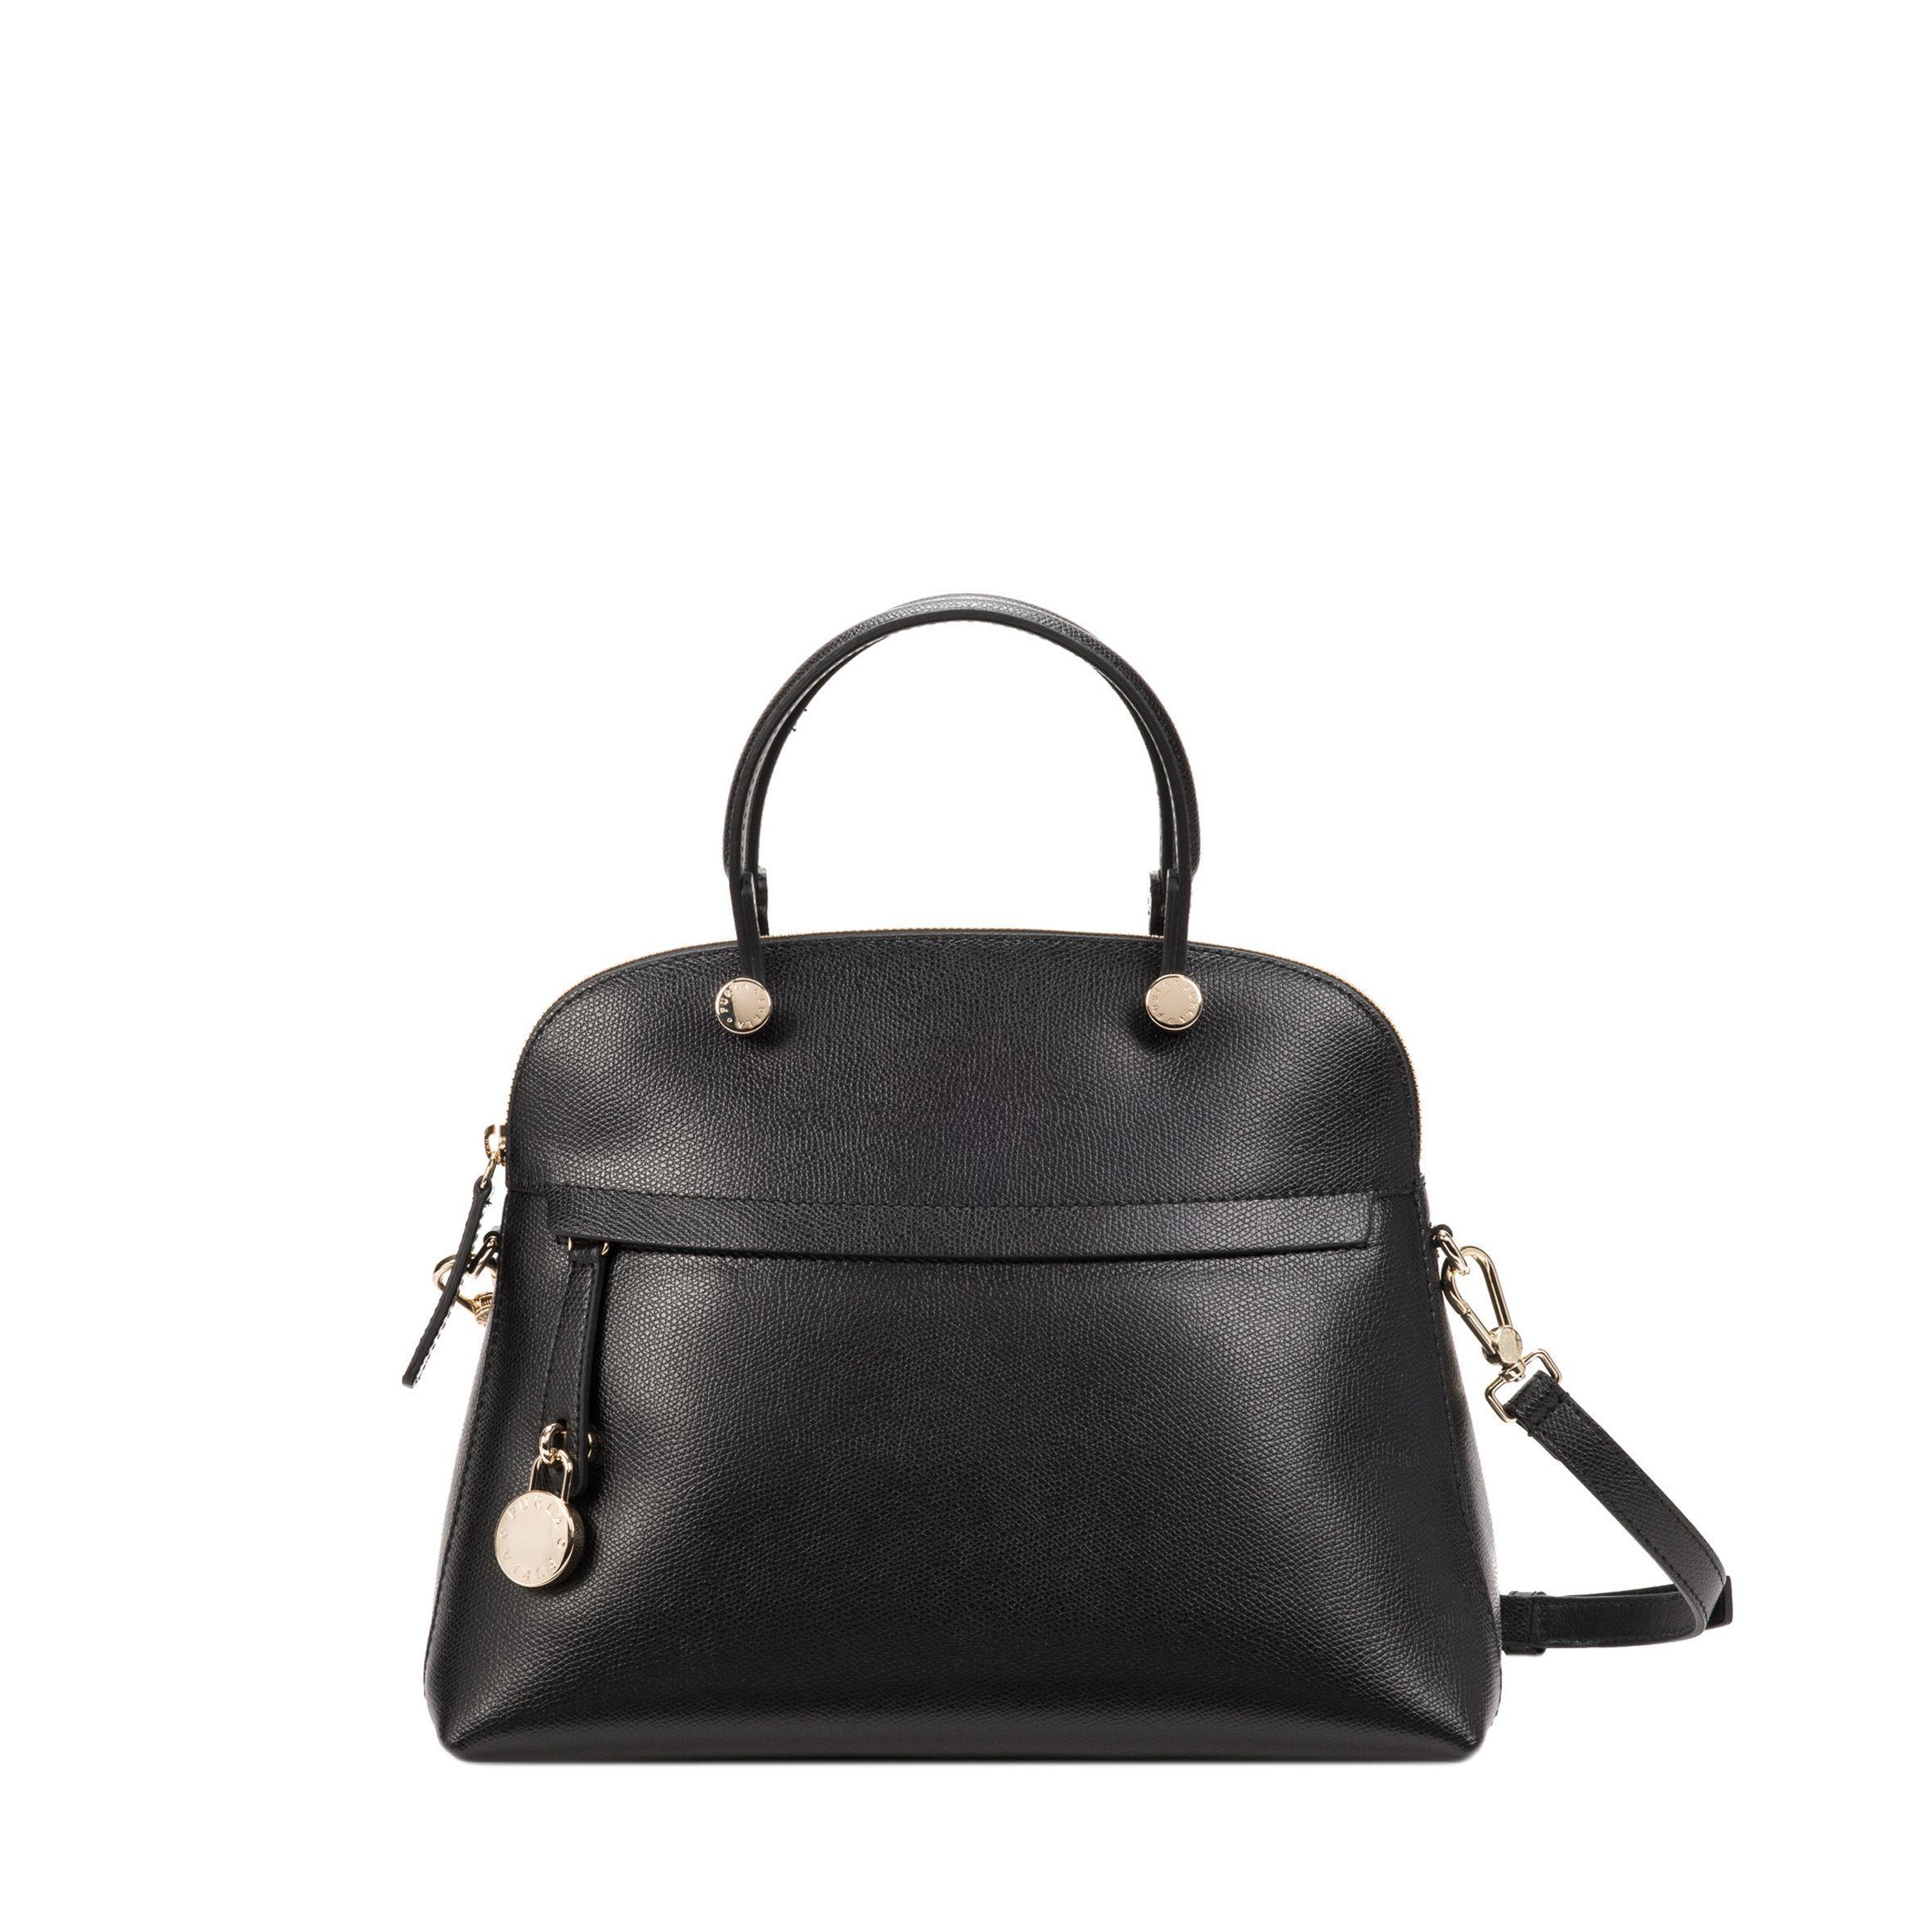 Furla Piper Leather Bag In Black